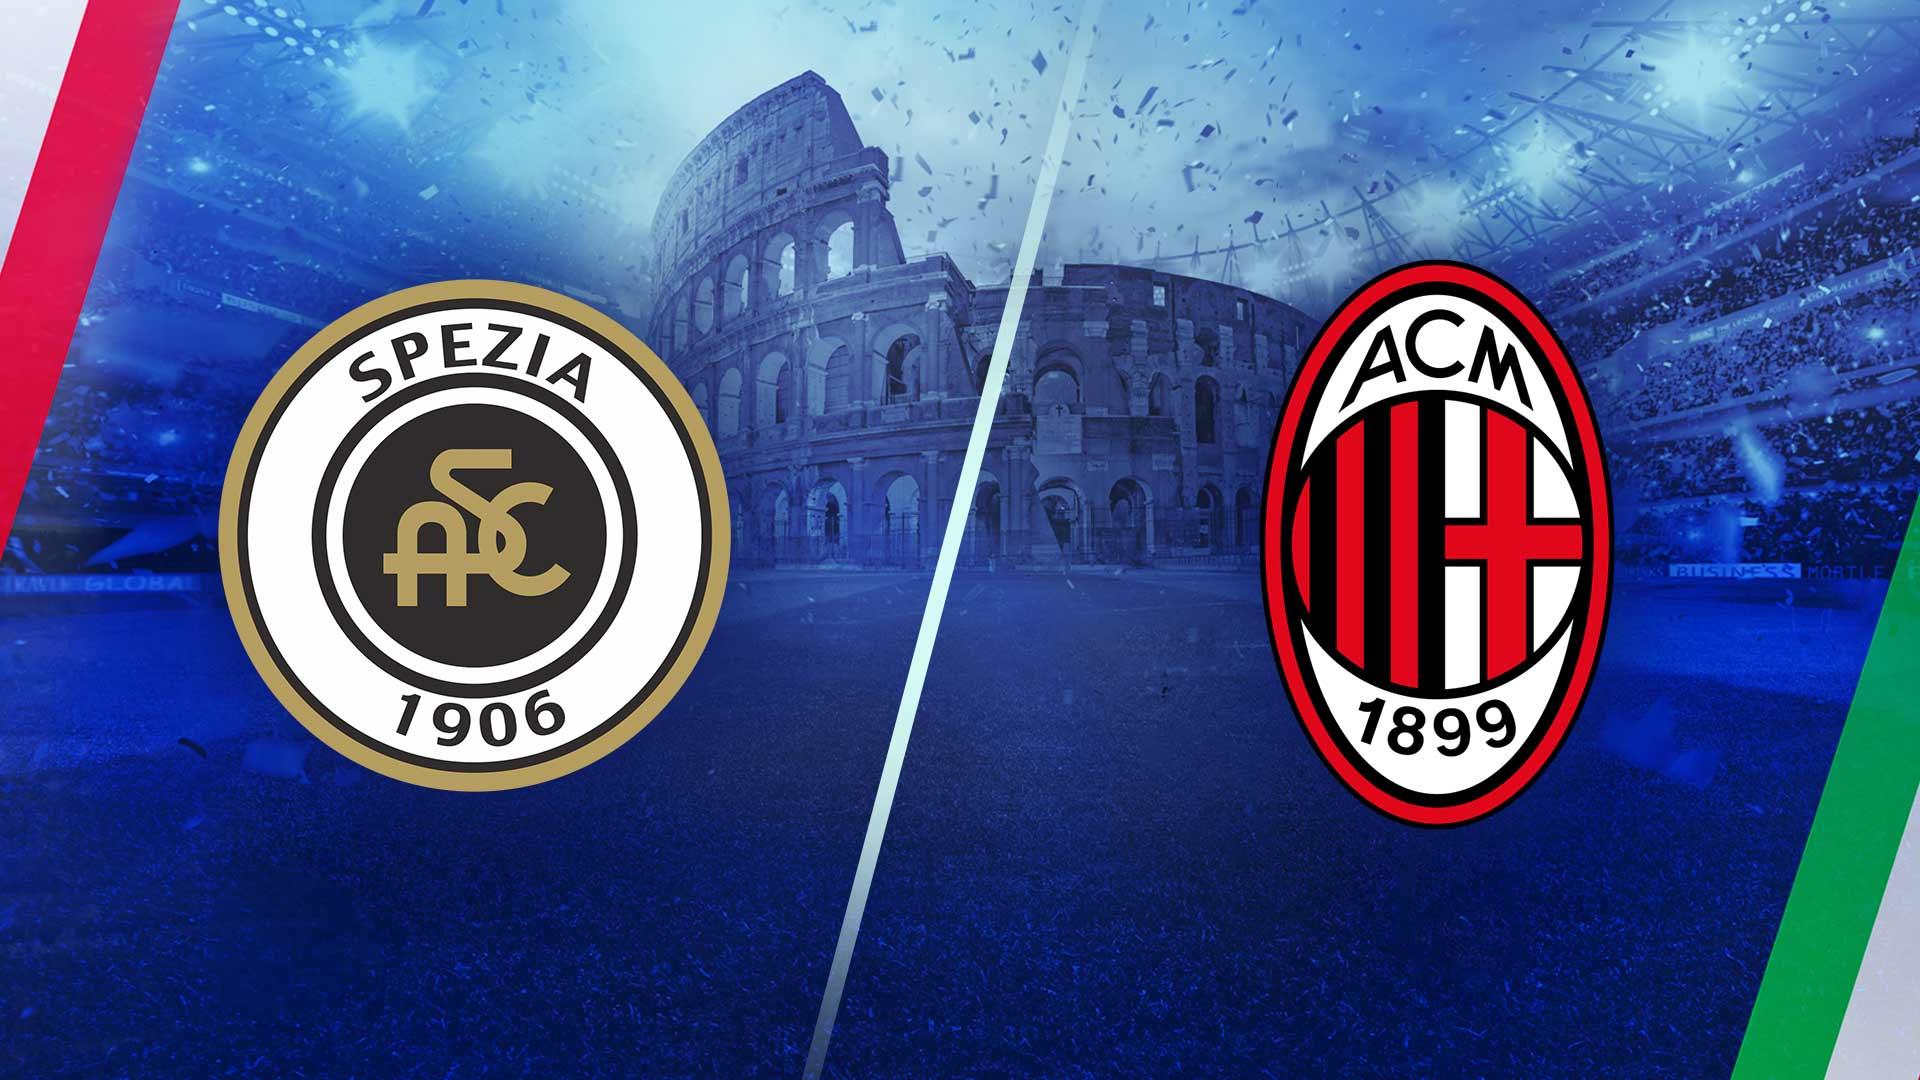 Spezia vs AC Milan Highlights 25 September 2021